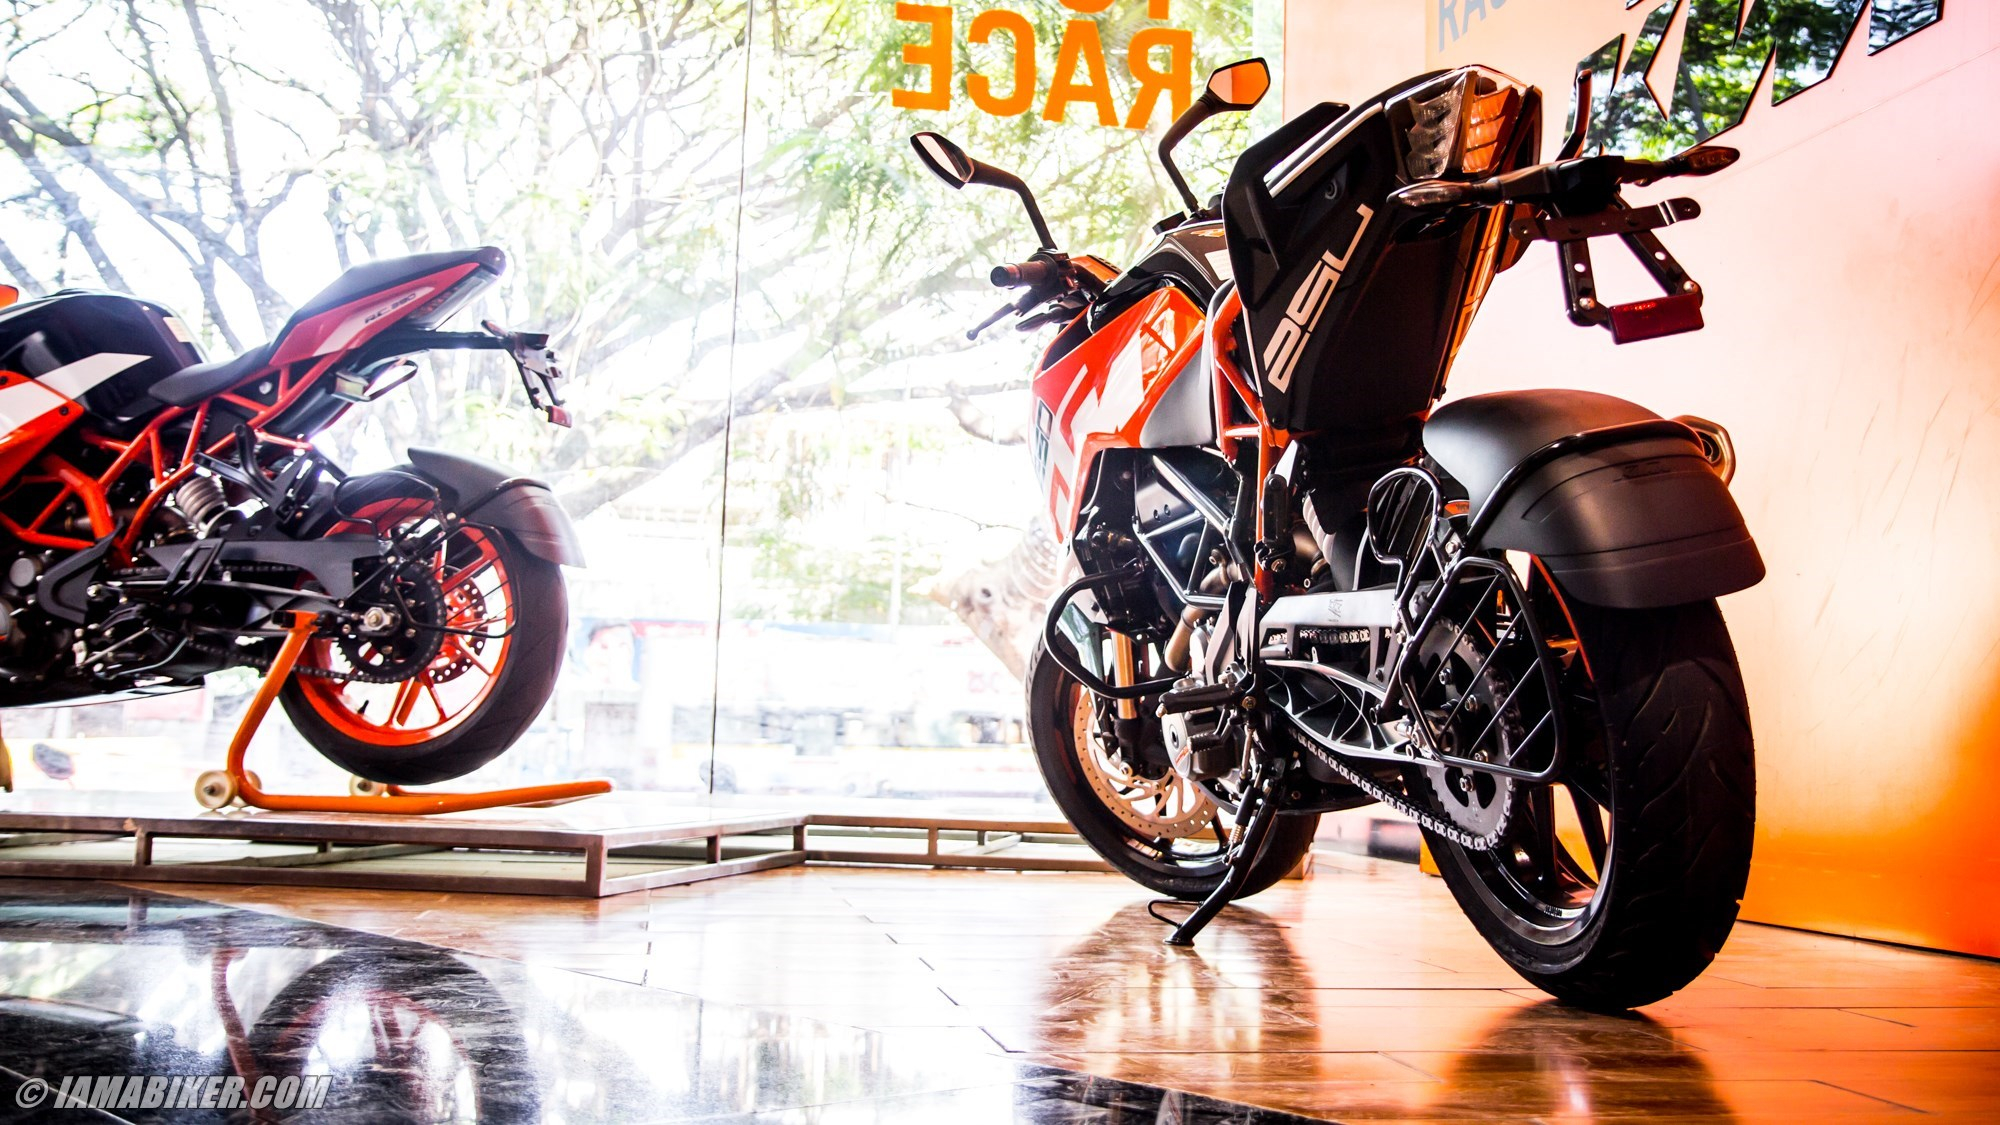 Ktm Duke 250 Hd Wallpaper Iamabiker Everything Motorcycle